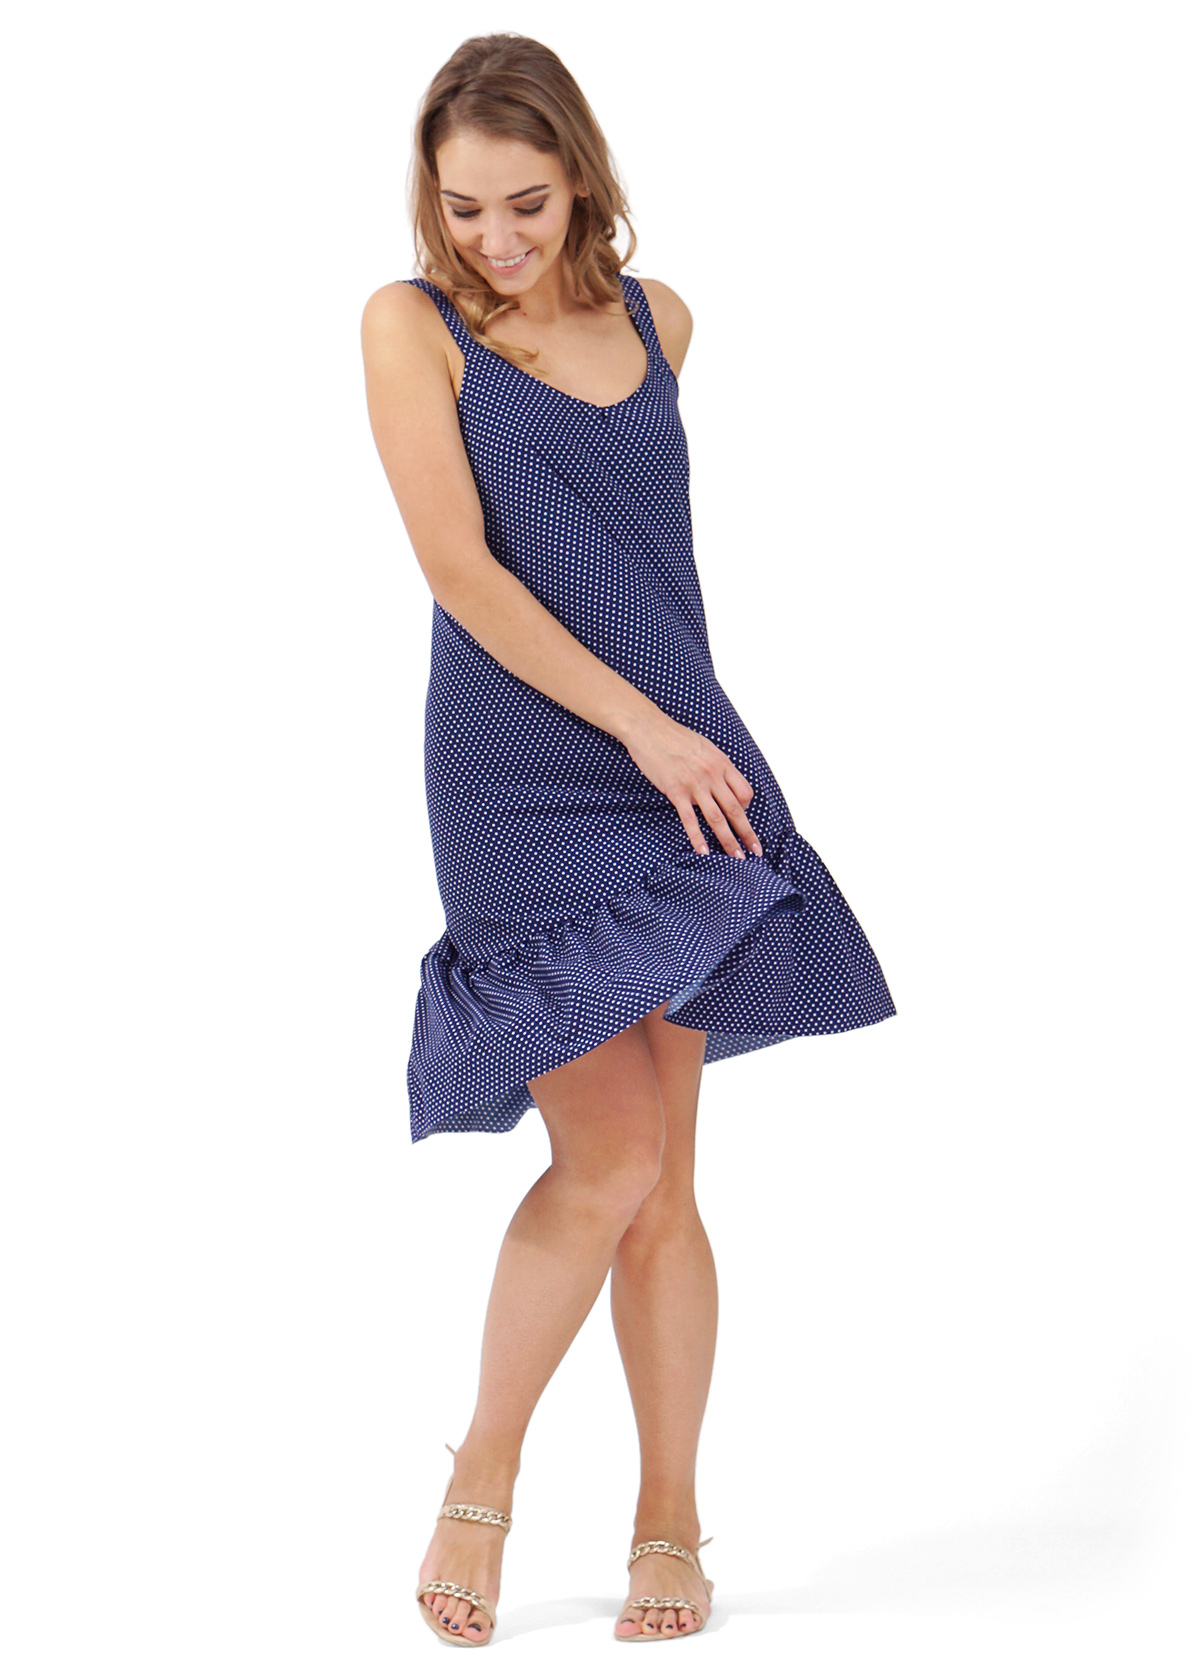 Designer Maternity Clothes   Maternity Sundress   Maternity Bodycon Dresses